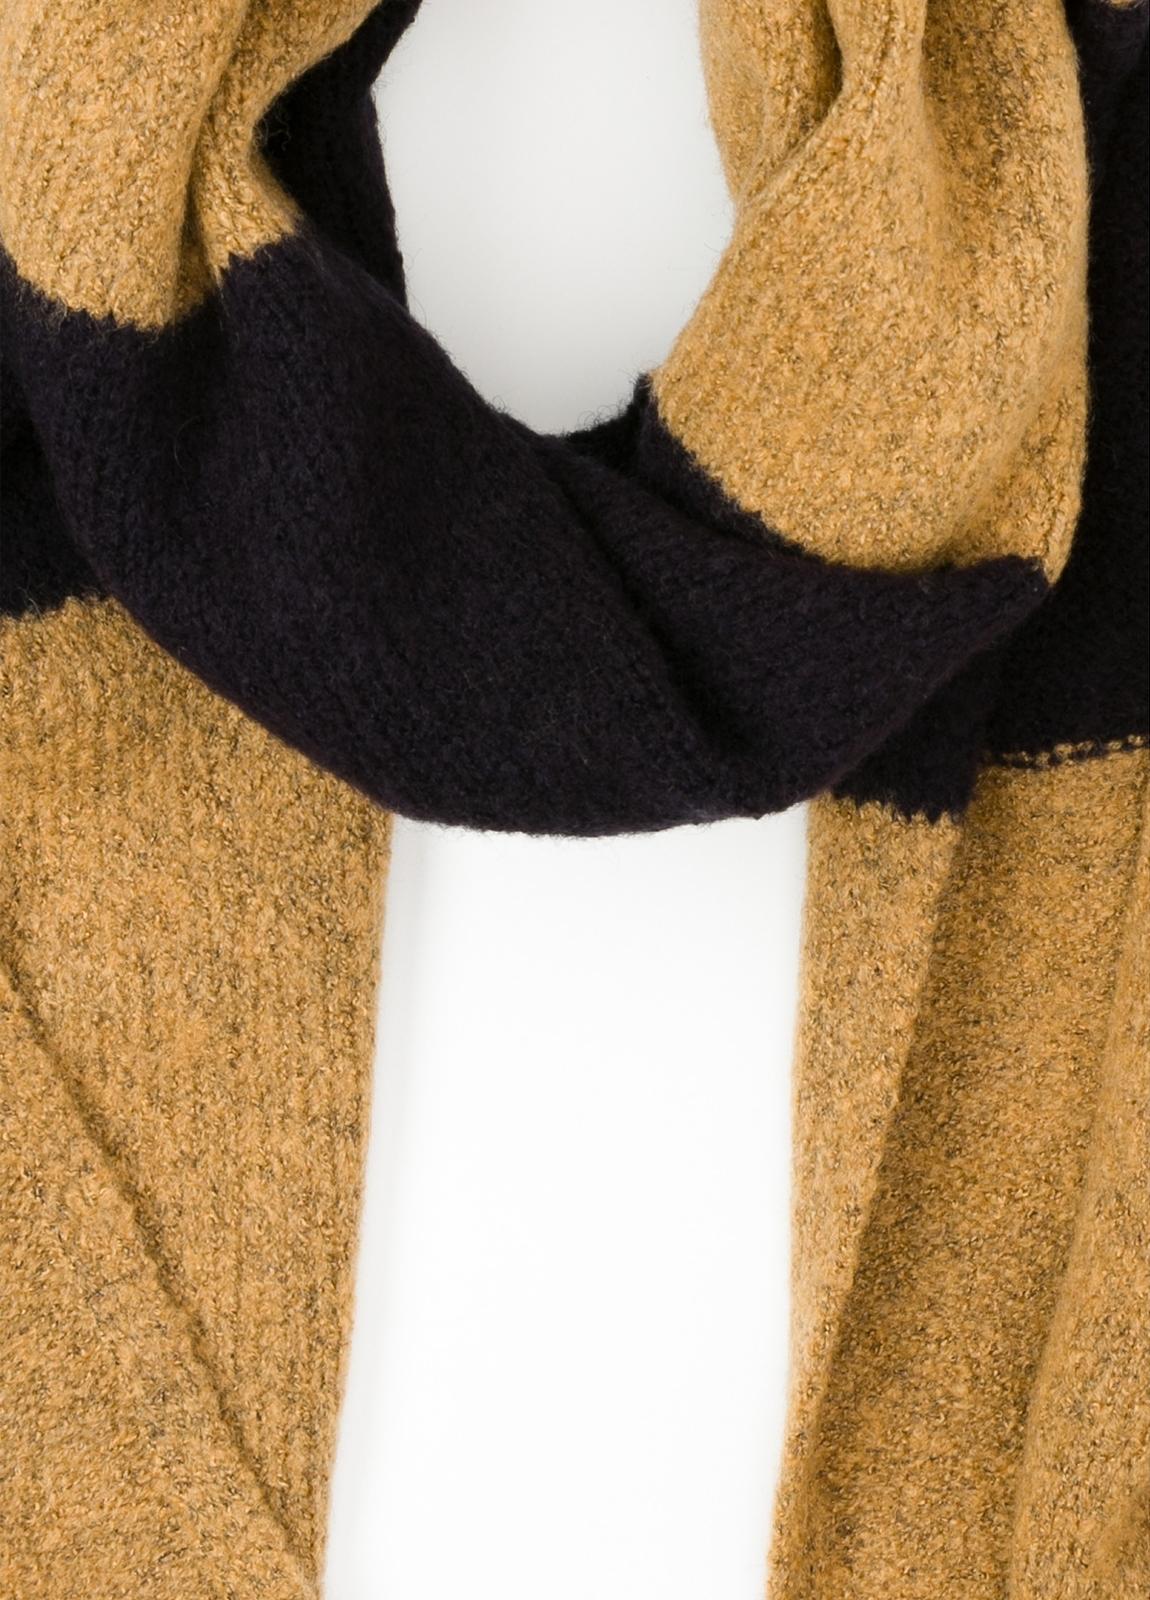 Bufanda de rayas anchas color amarillo, 180 x 40 cm, mezcla de lana cepillada. - Ítem1